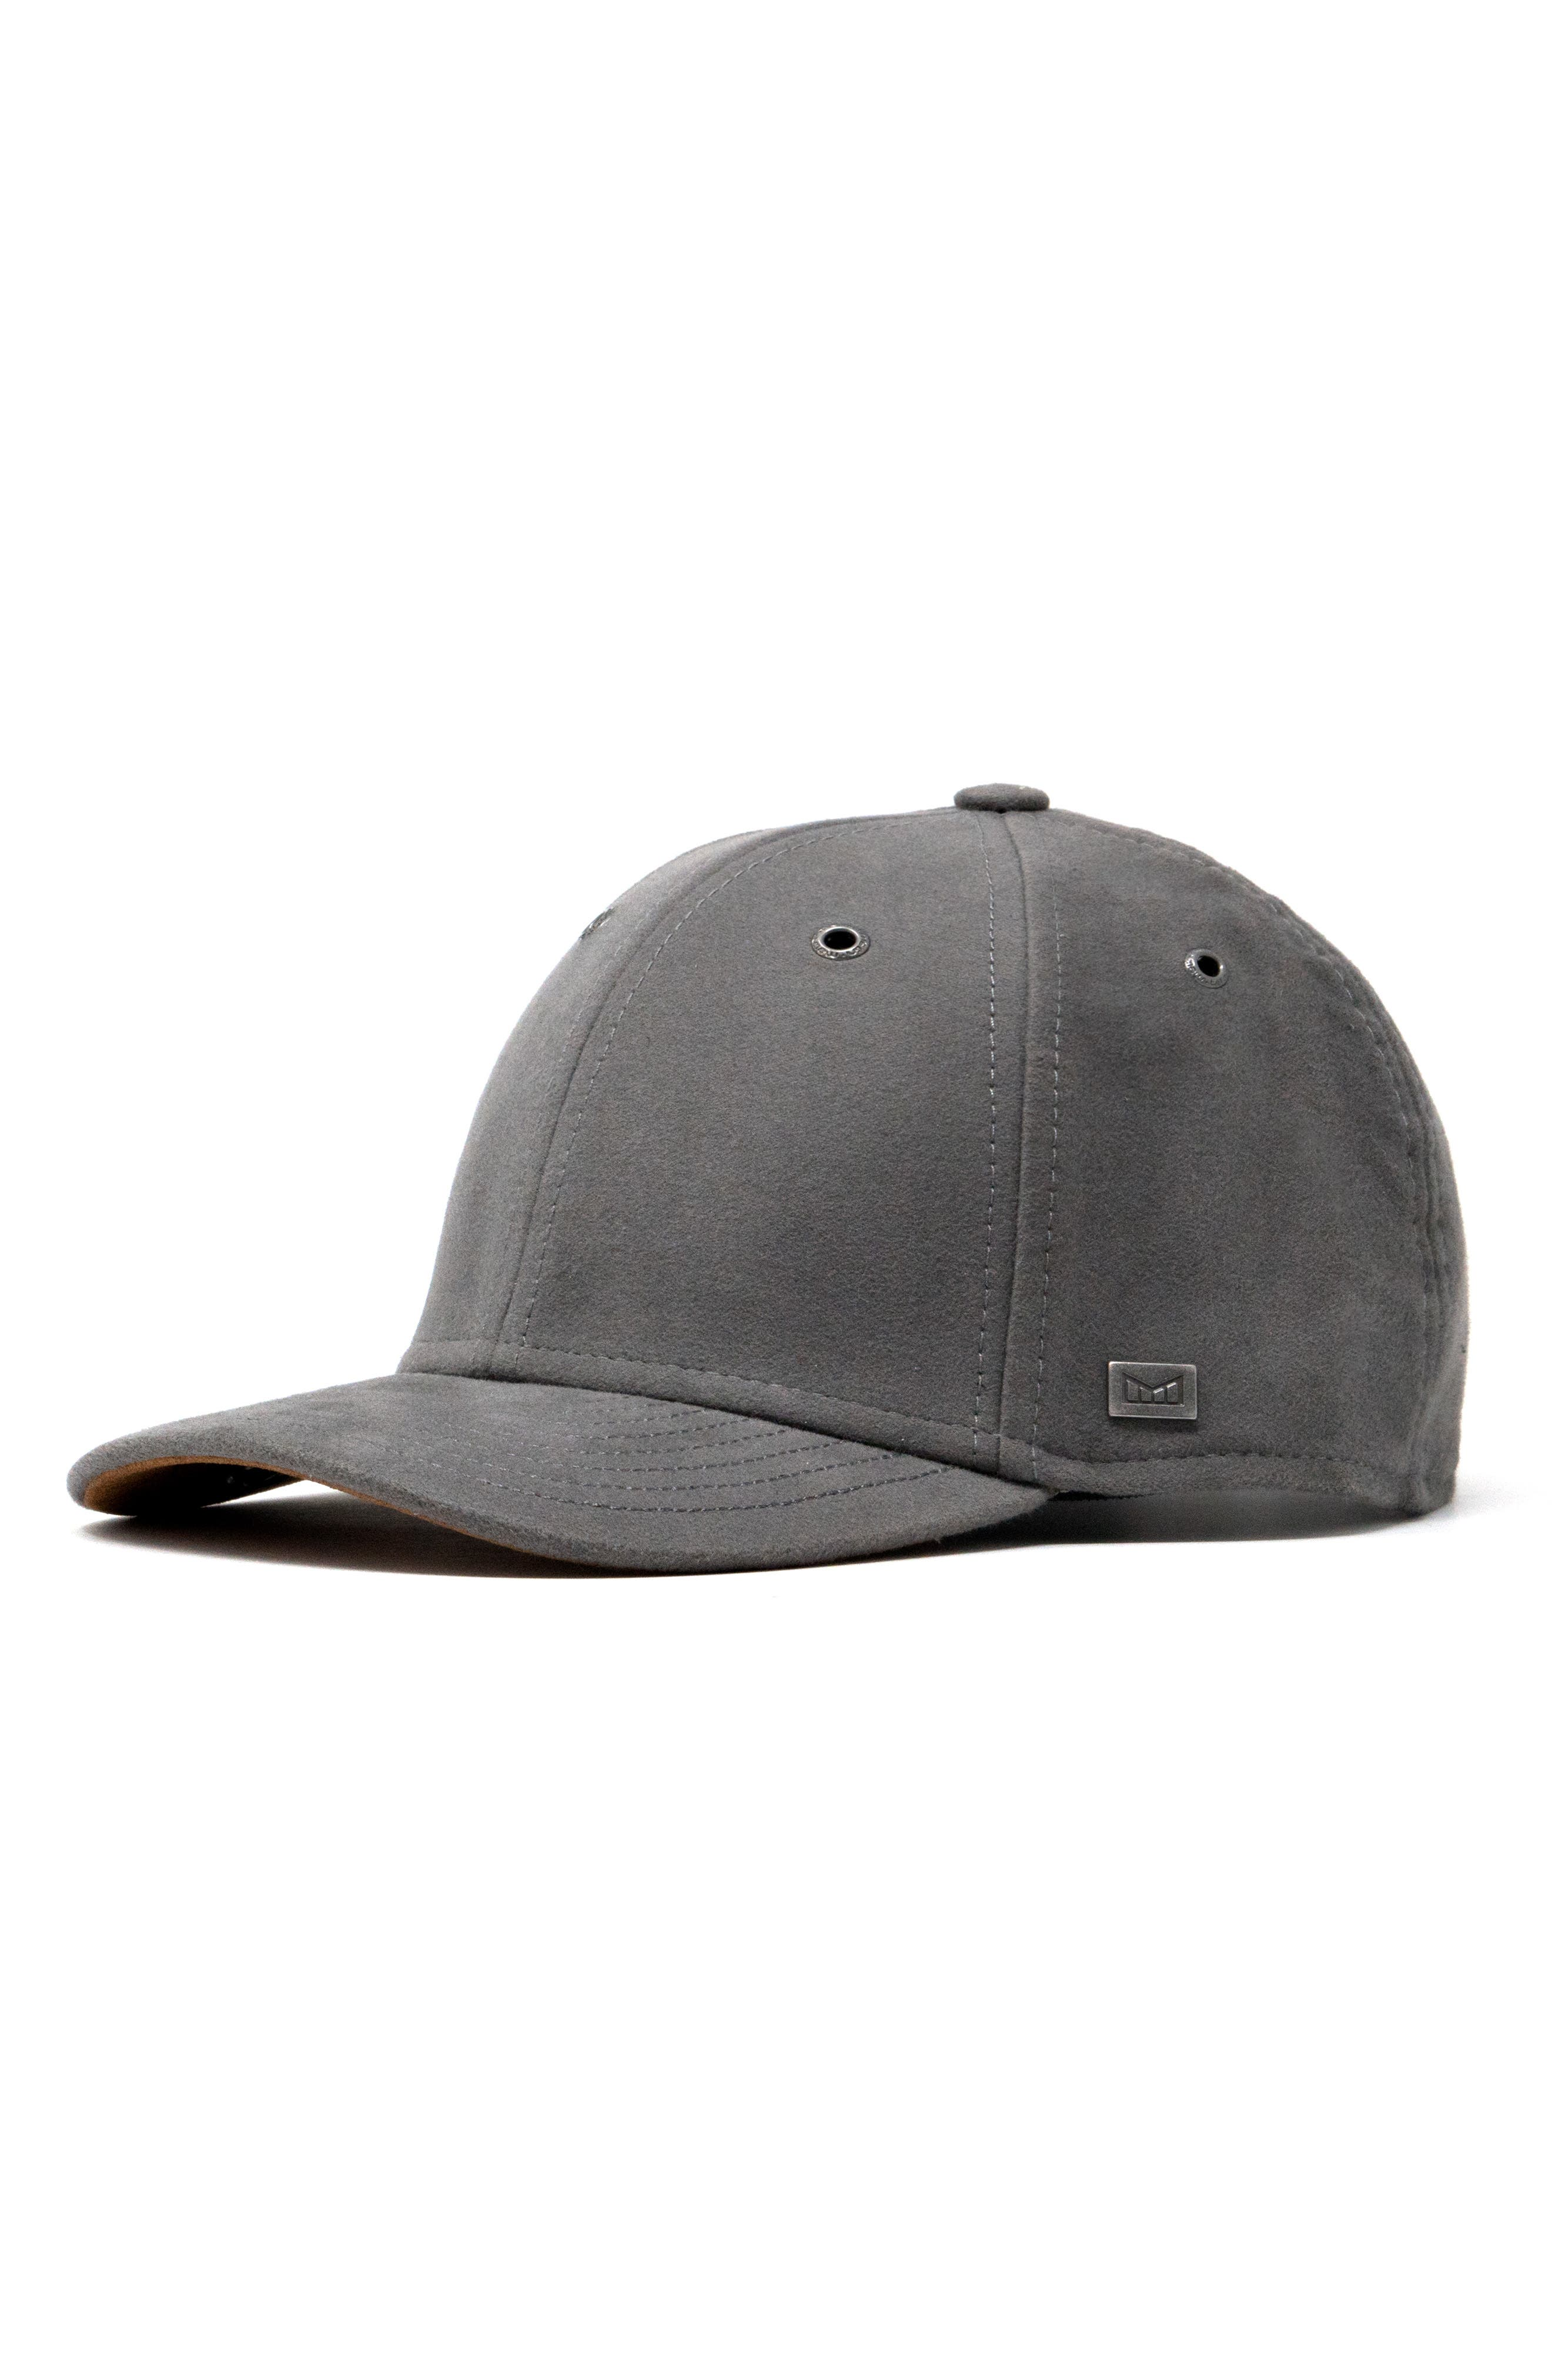 MELIN Ace Ball Cap - Grey